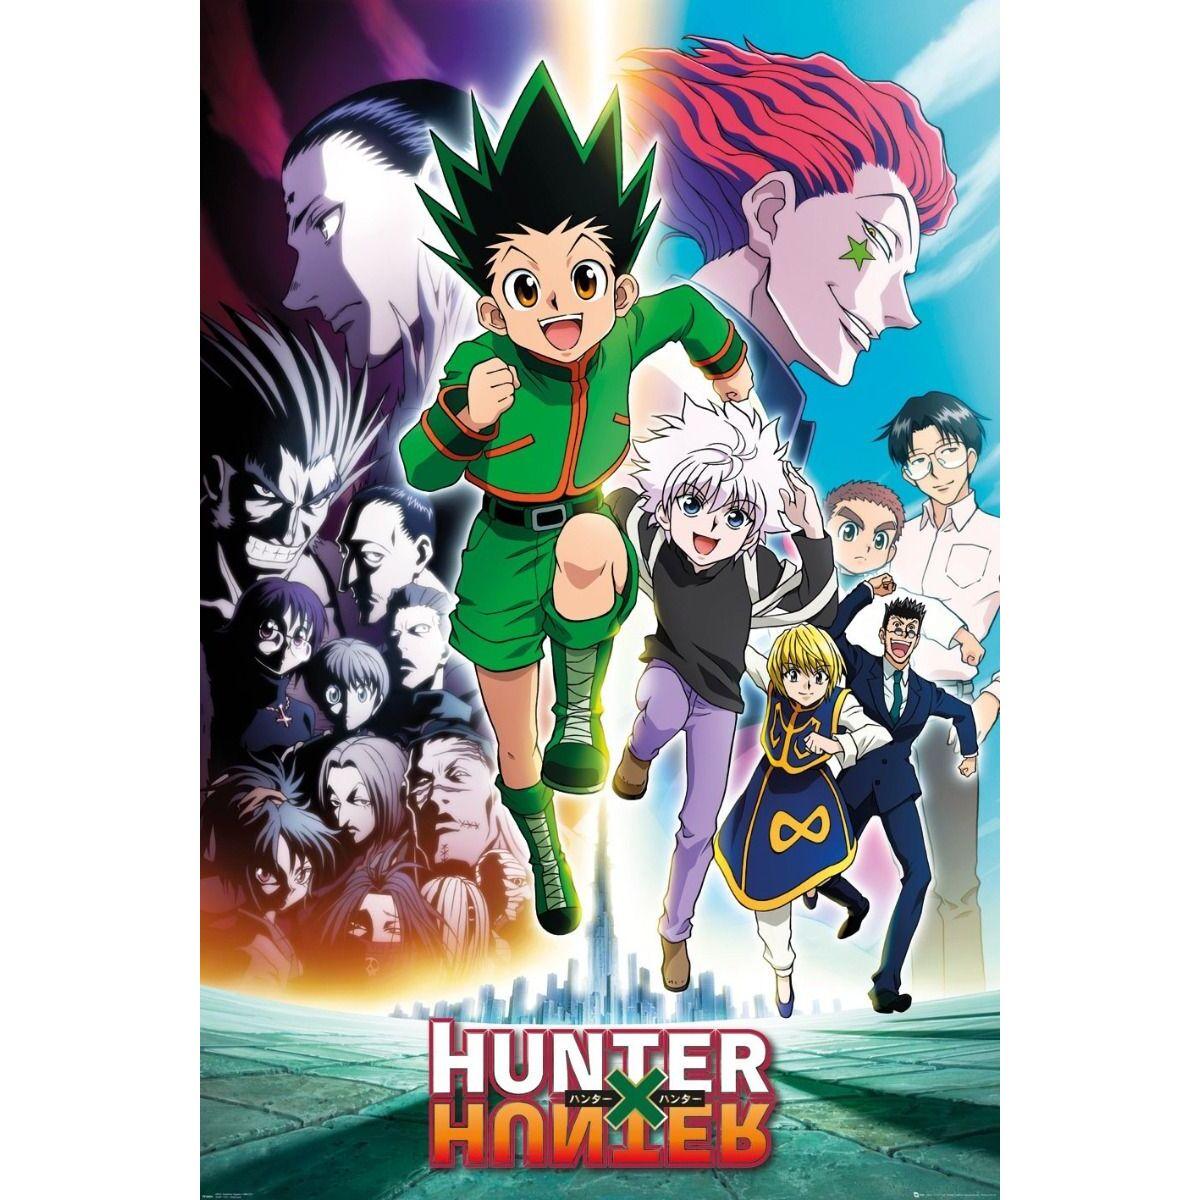 160935-hunter-x-hunter-poster